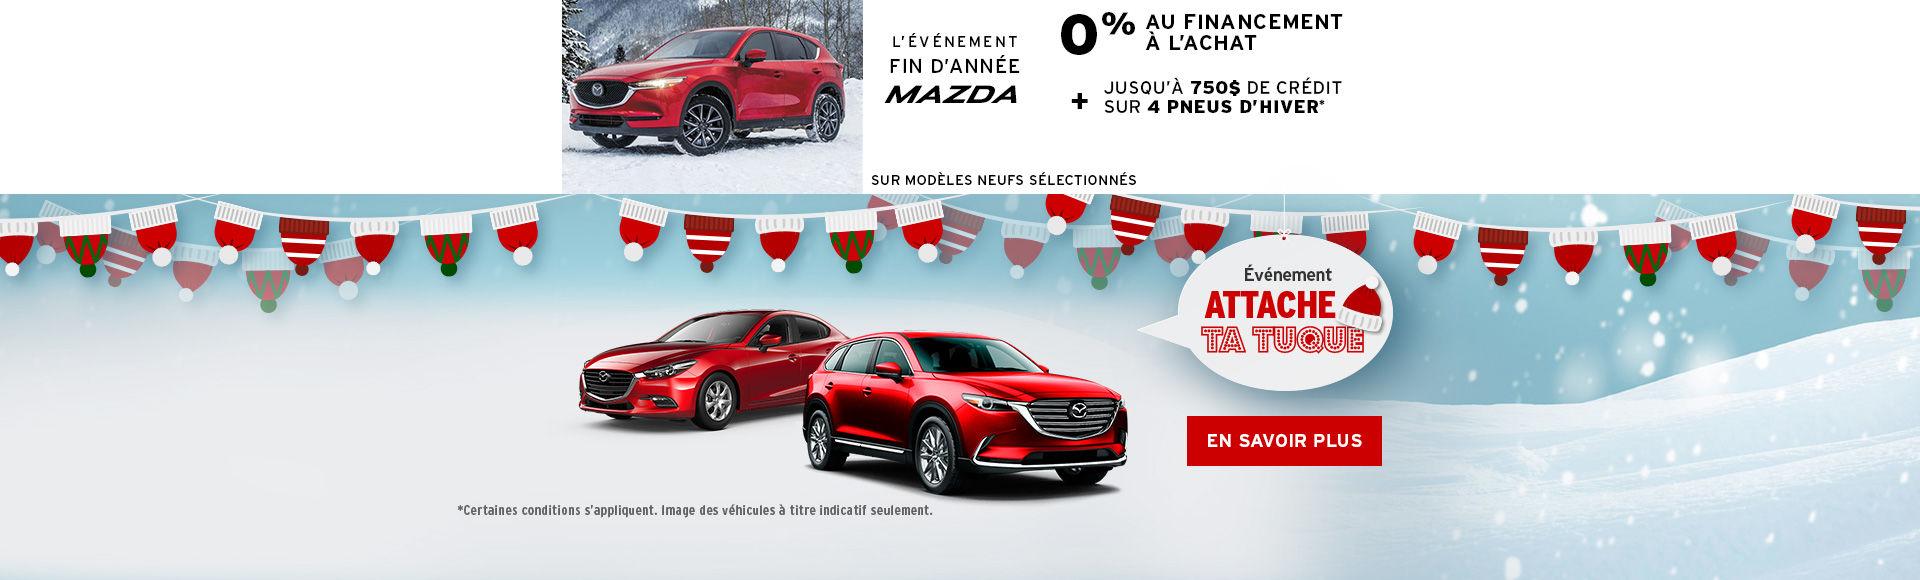 L'événement de Mazda! - attache ta tuque headers